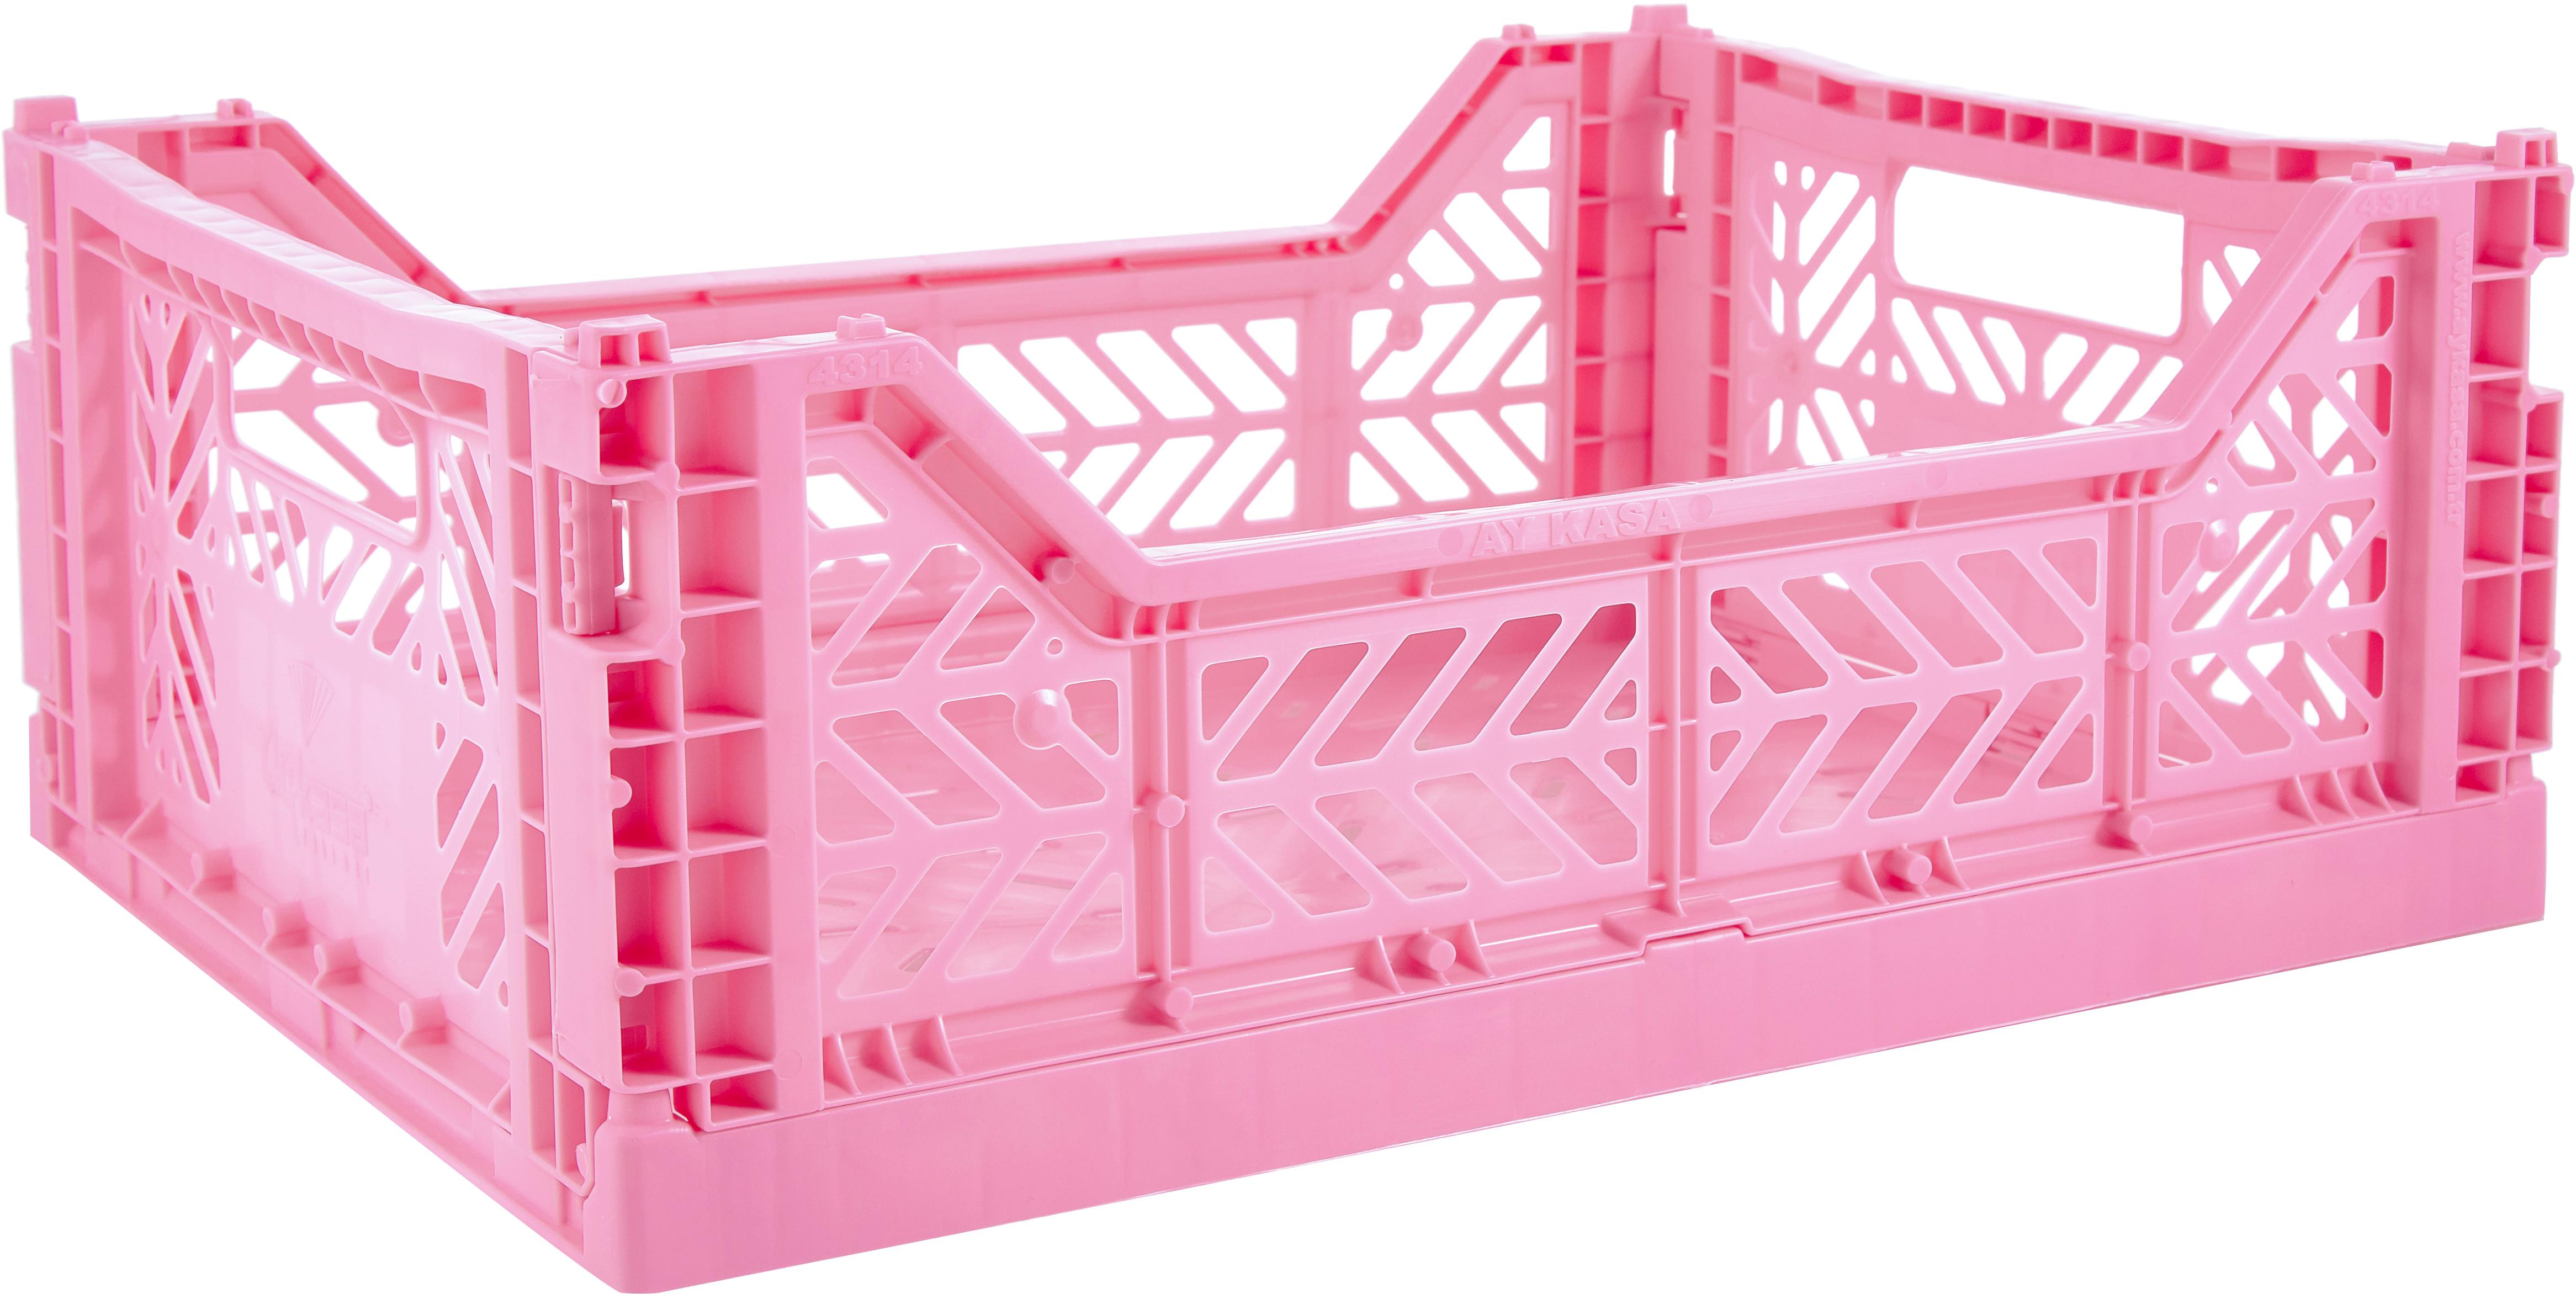 Caja pegable apilable Pink, mediana, Plástico reciclado, Rosa, An 40 x Al 14 cm